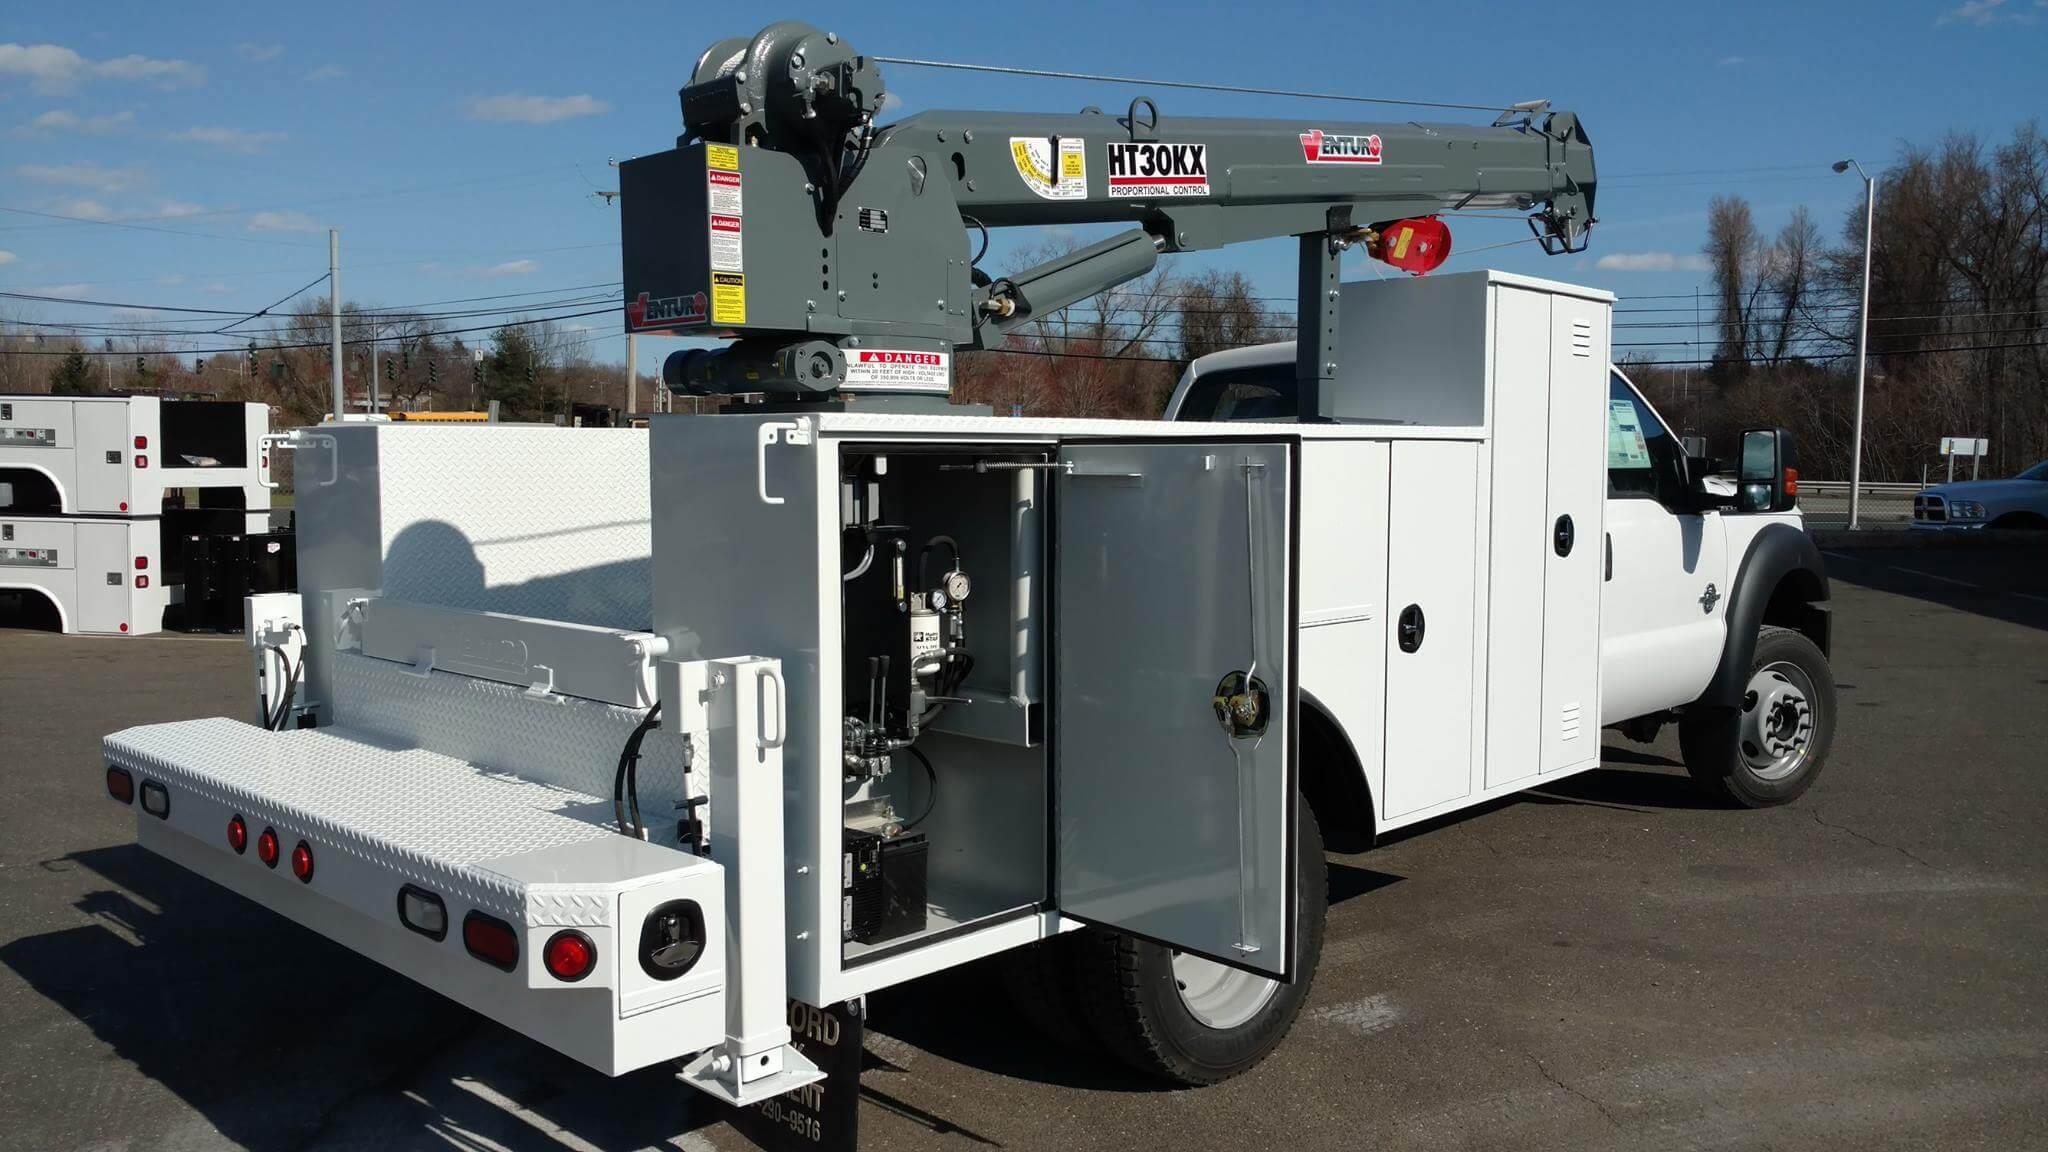 Venturo Hydraulic Crane